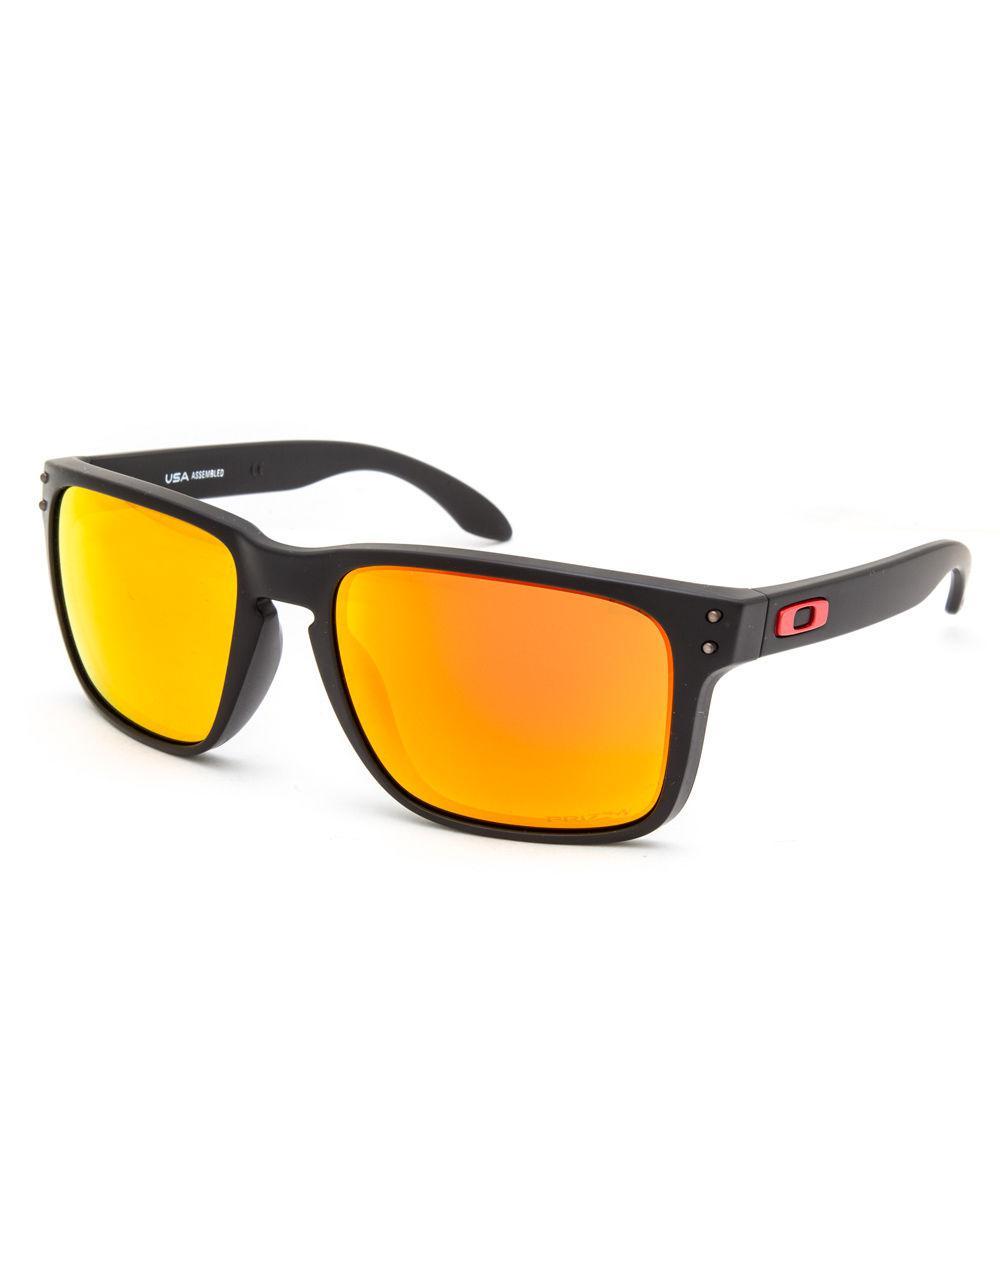 b5b5d6e5e4 Lyst - Oakley Holbrook Xl Matte Black   Prizm Ruby Sunglasses in ...